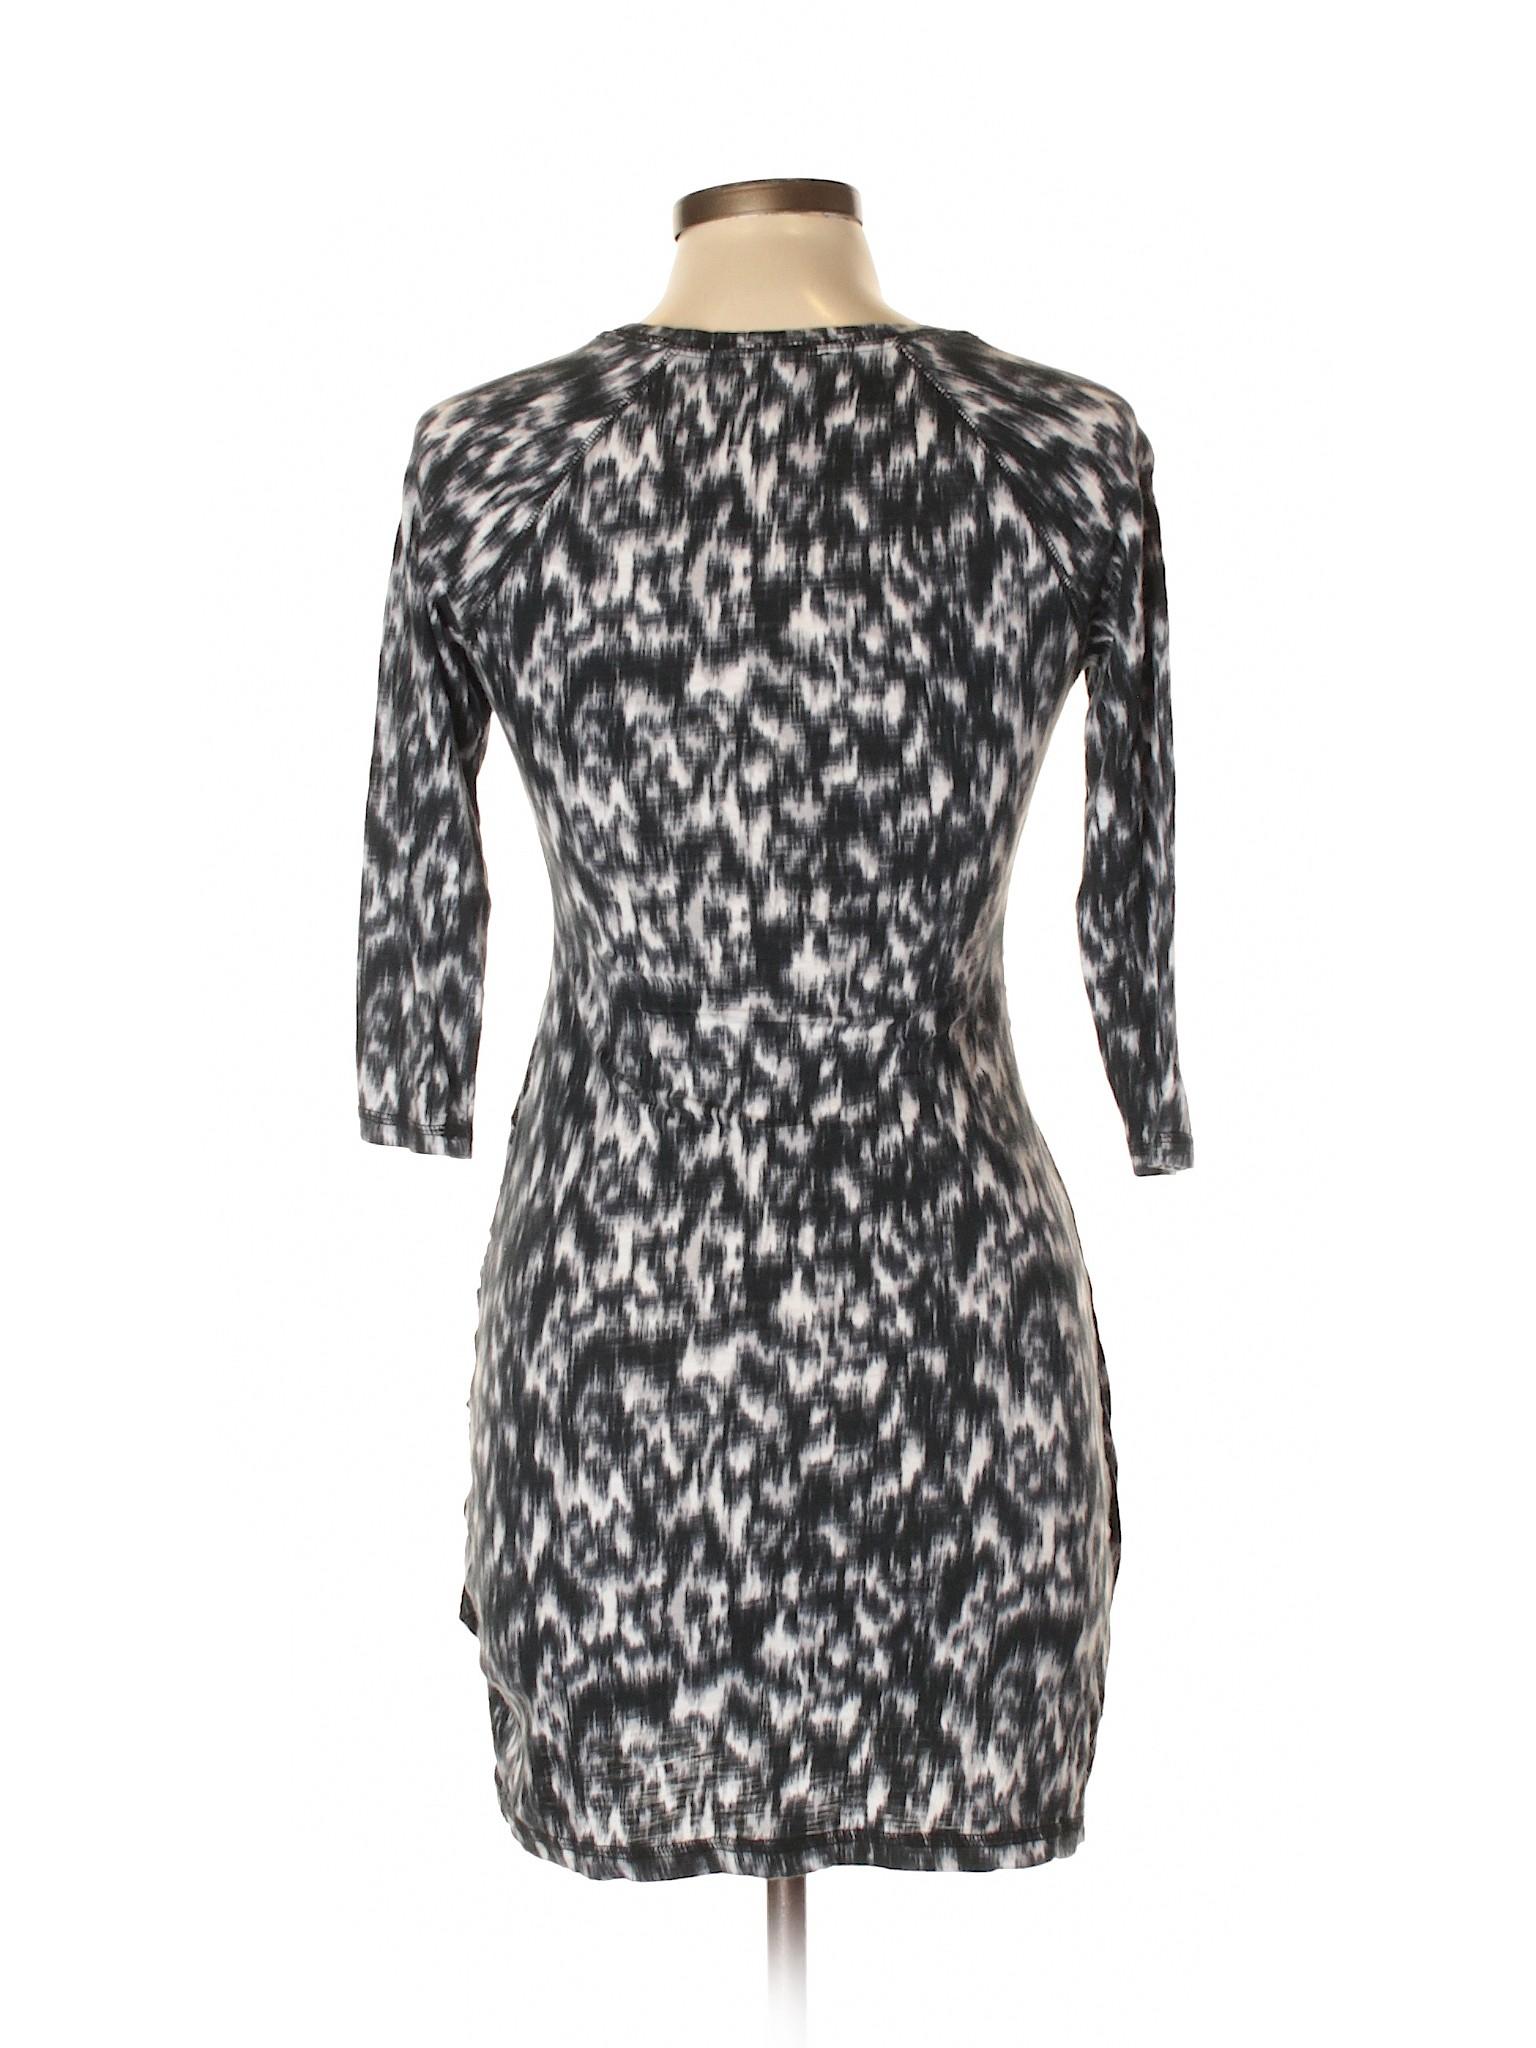 winter Dress Dress Express Casual Casual Boutique winter Express winter Boutique Boutique Xwa7nIq